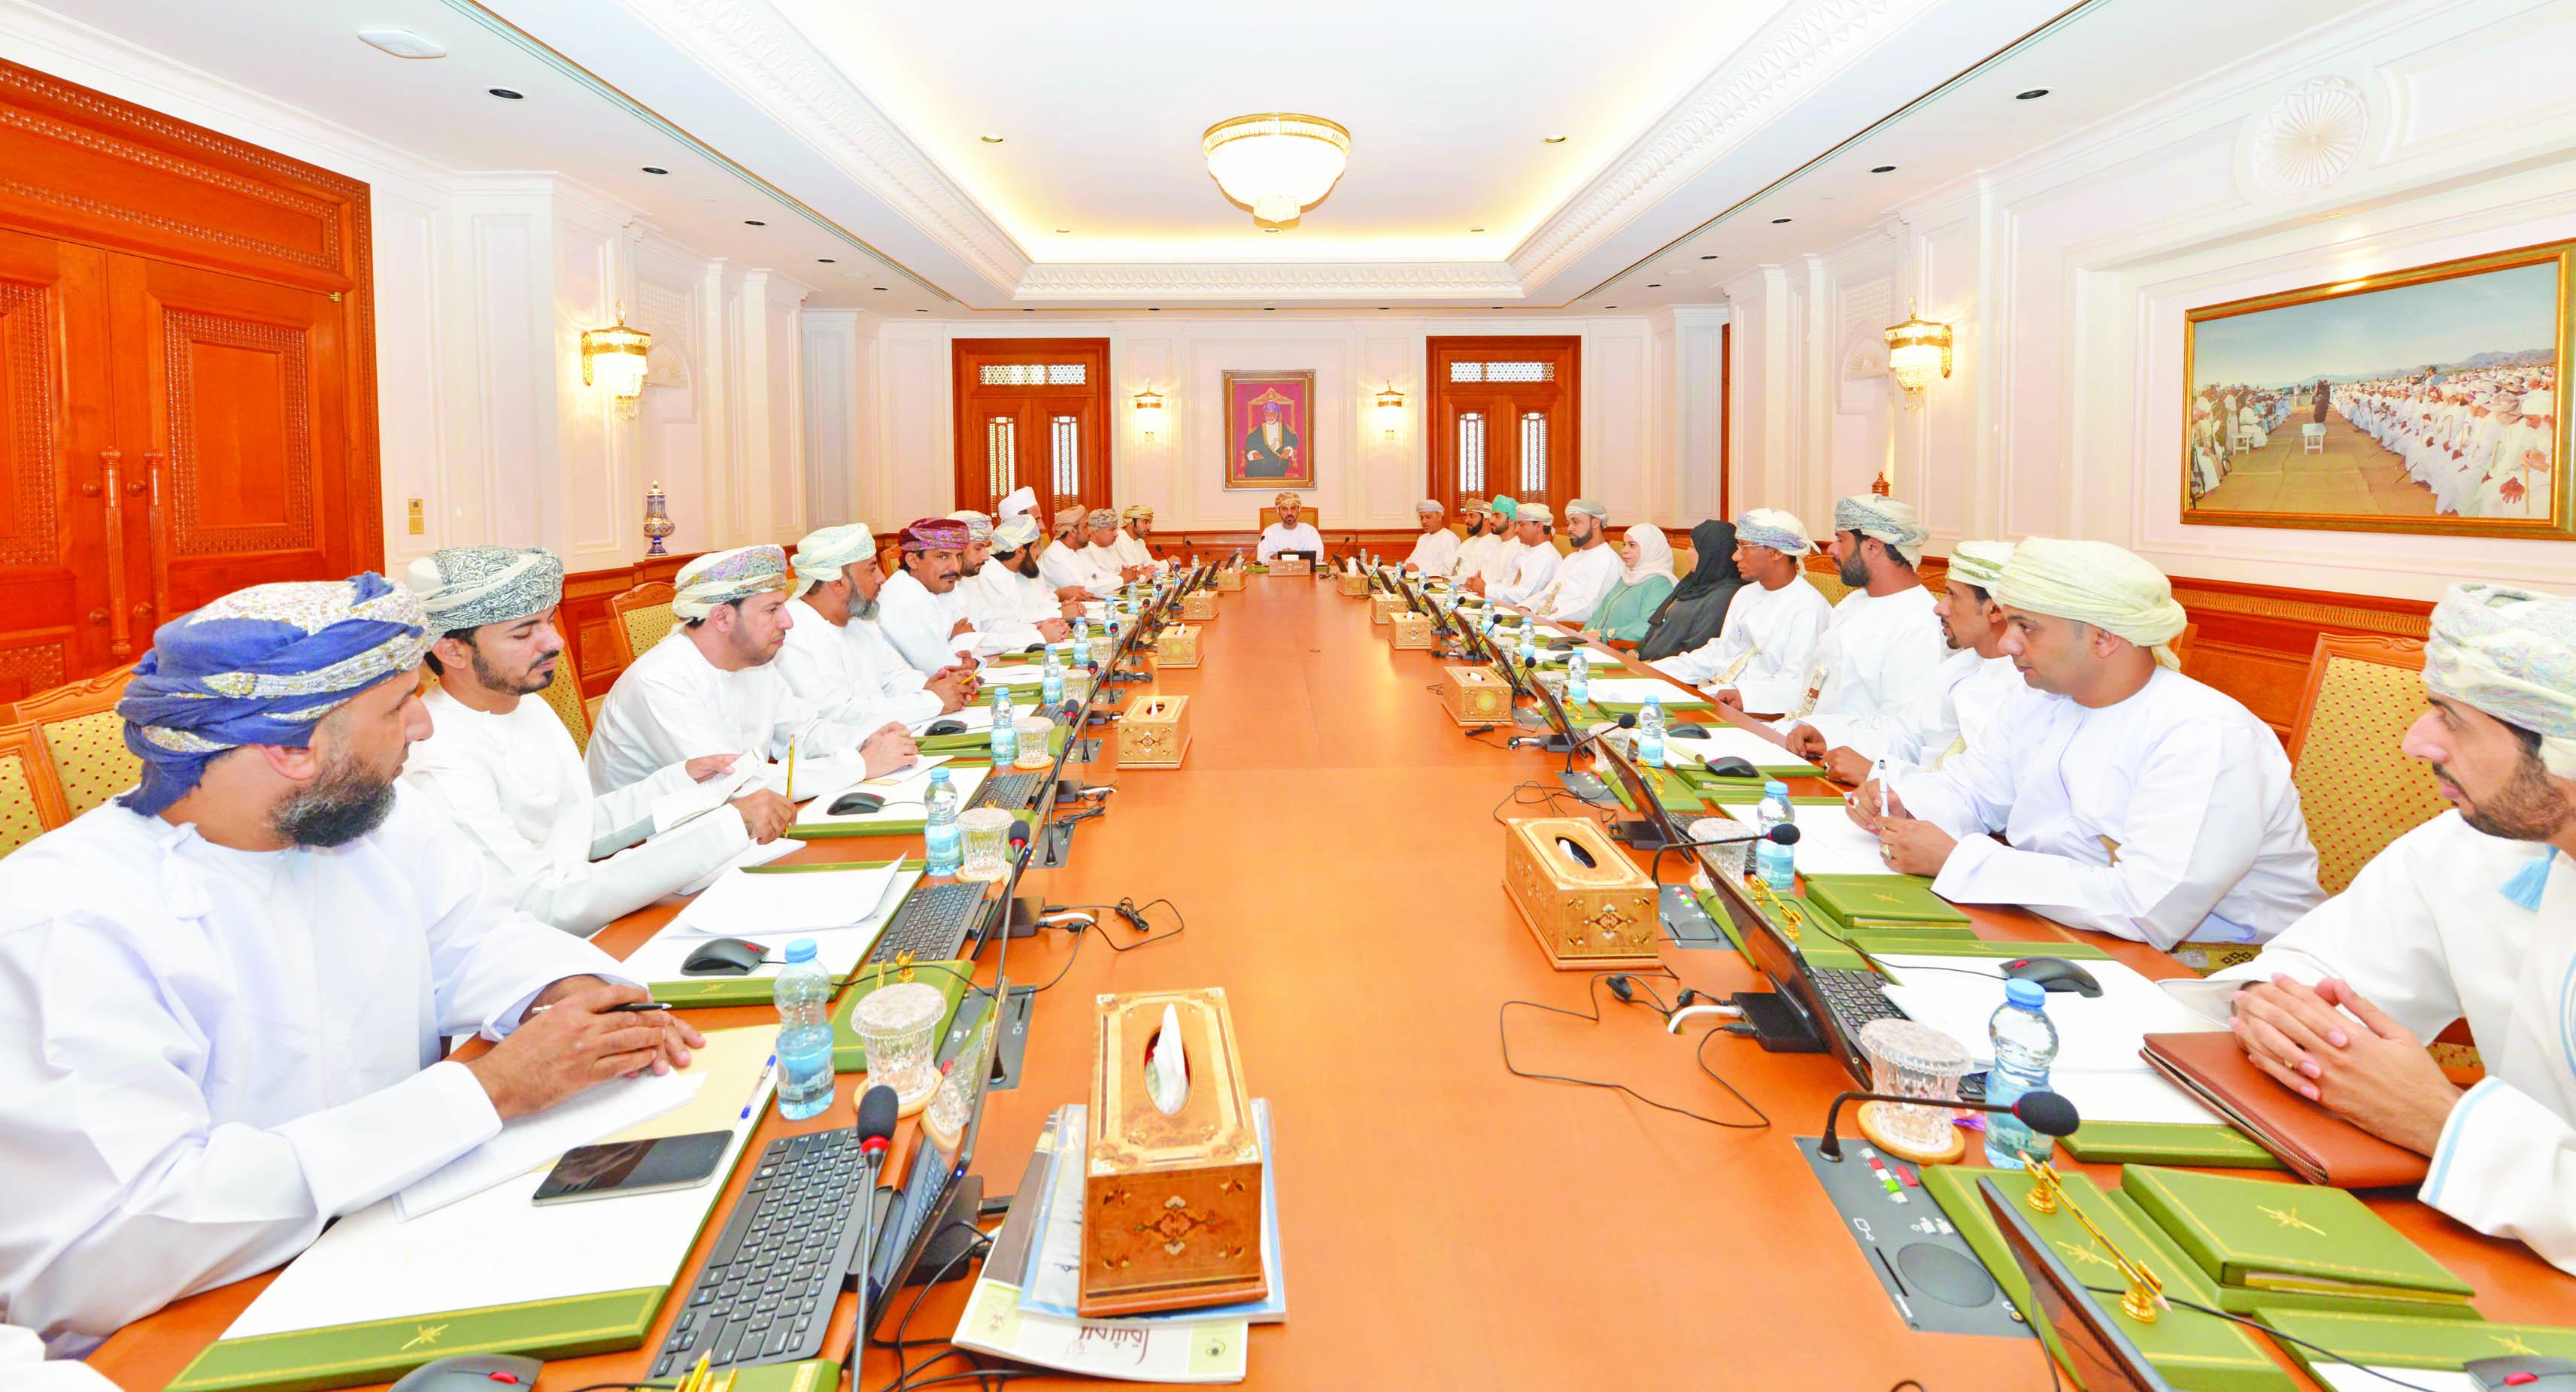 Majlis Al Shura, unions discuss layoffs, labour issues in Oman